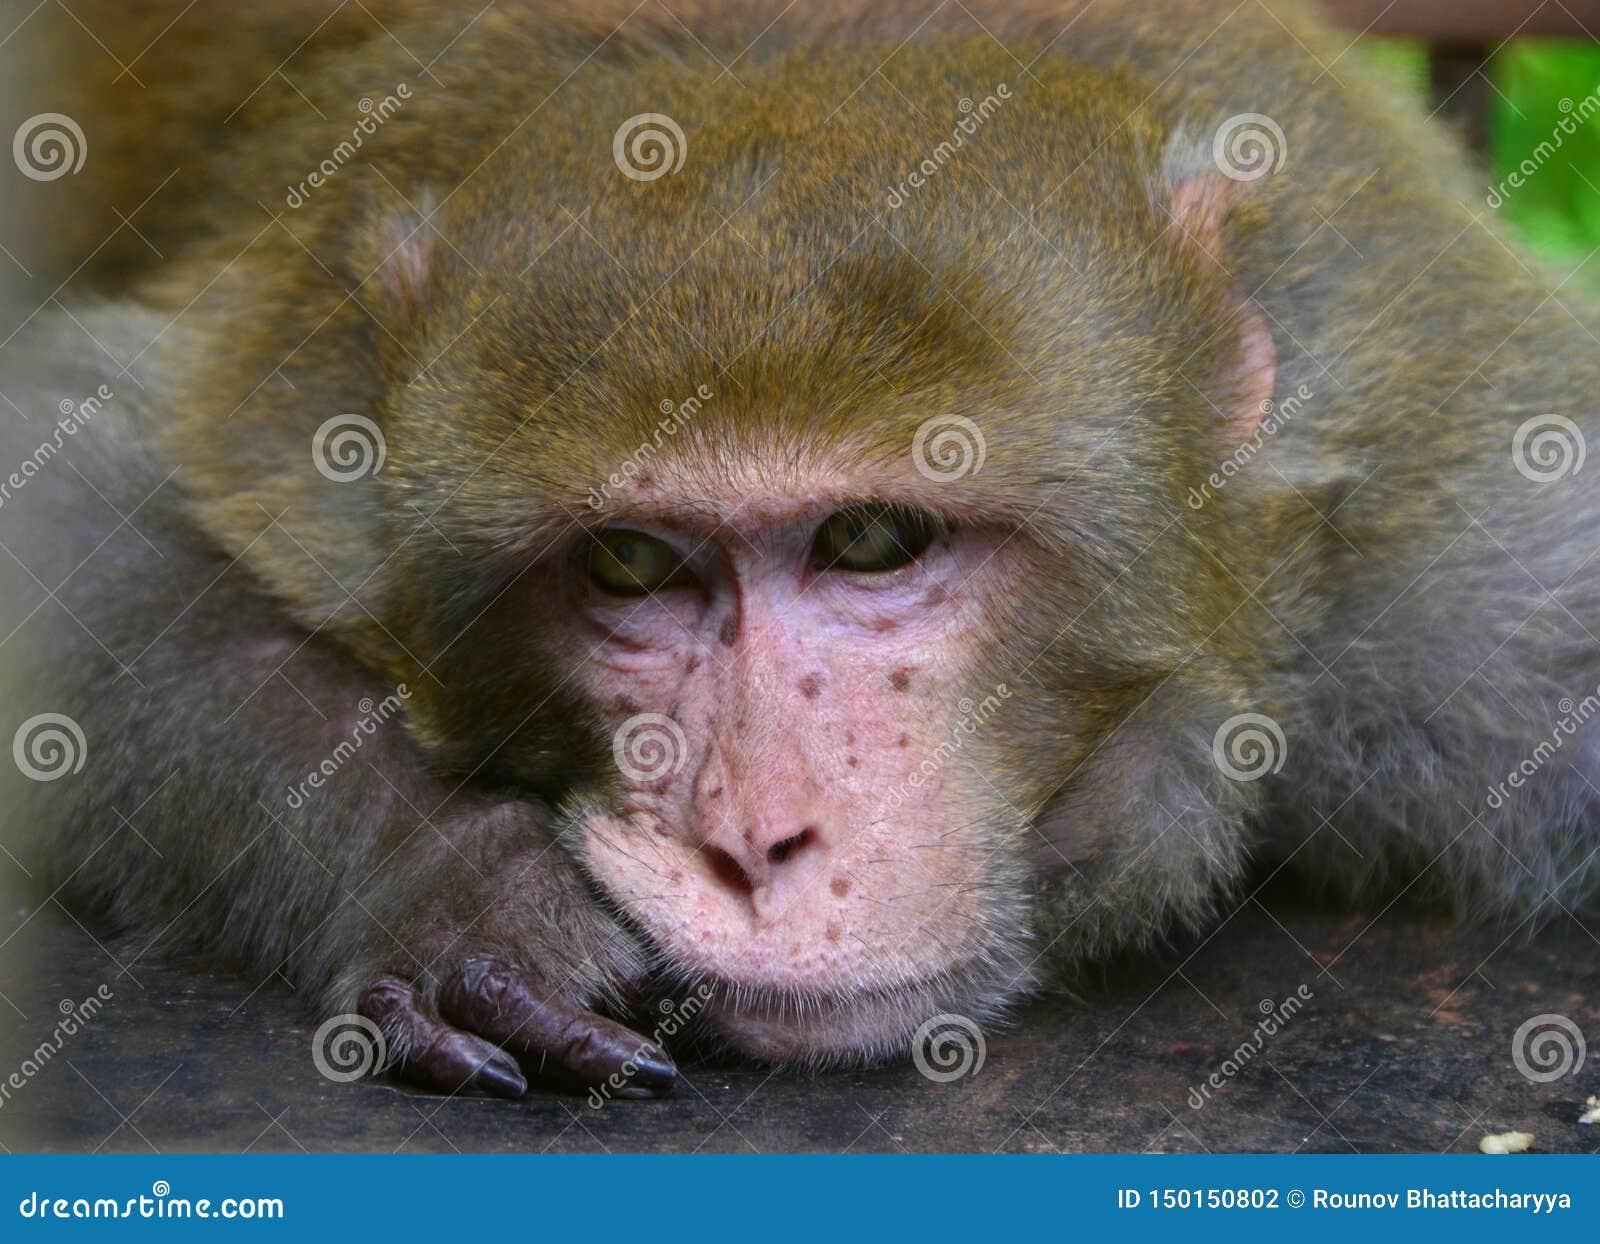 A lone macaque monkey portrait